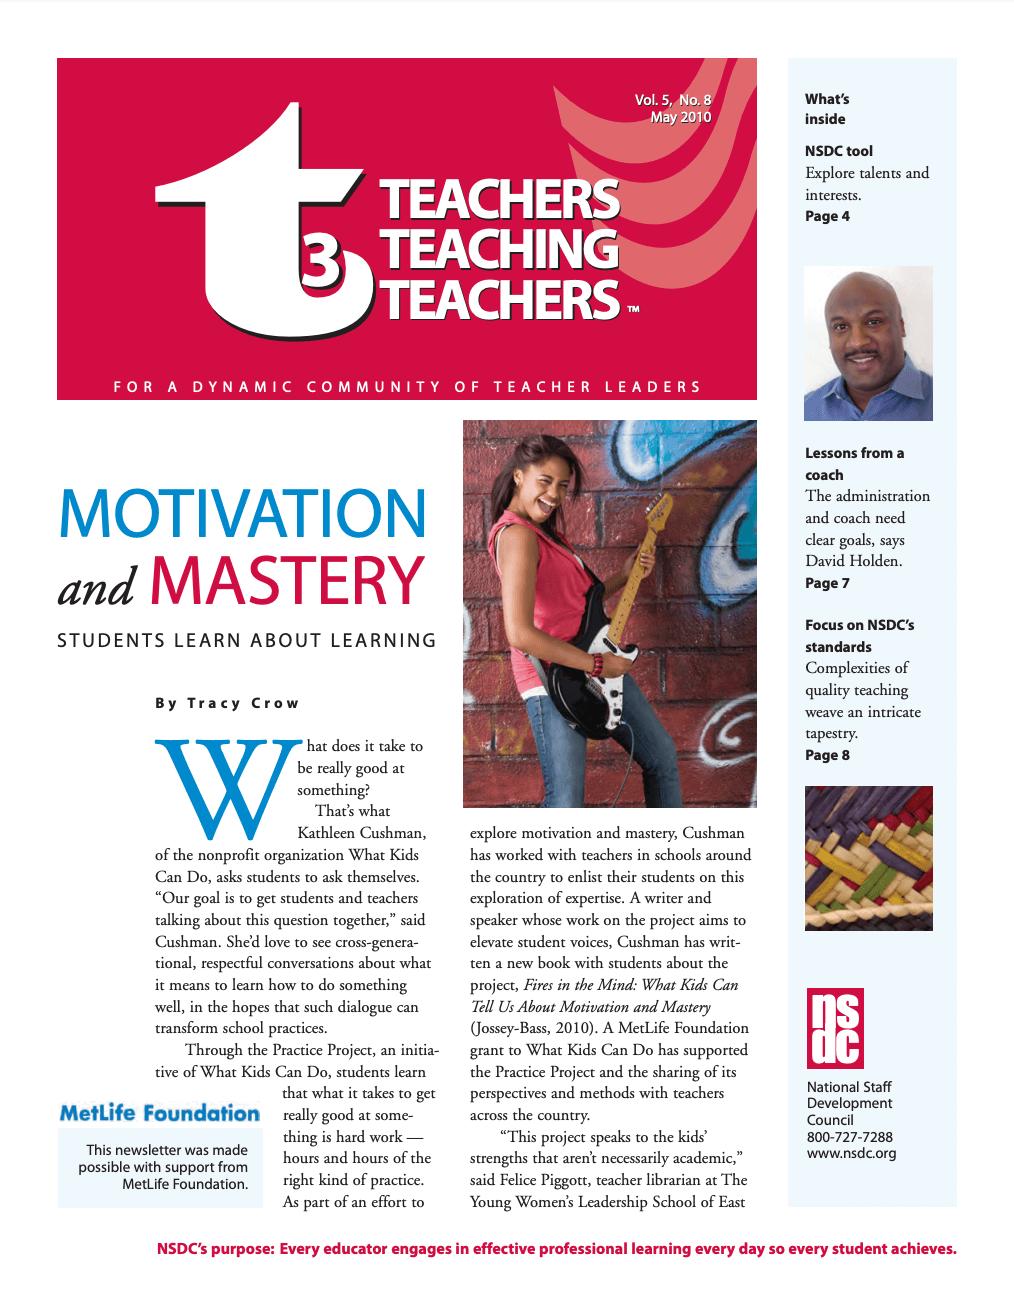 teachers-teaching-teachers-may-2010-vol-5-no-8